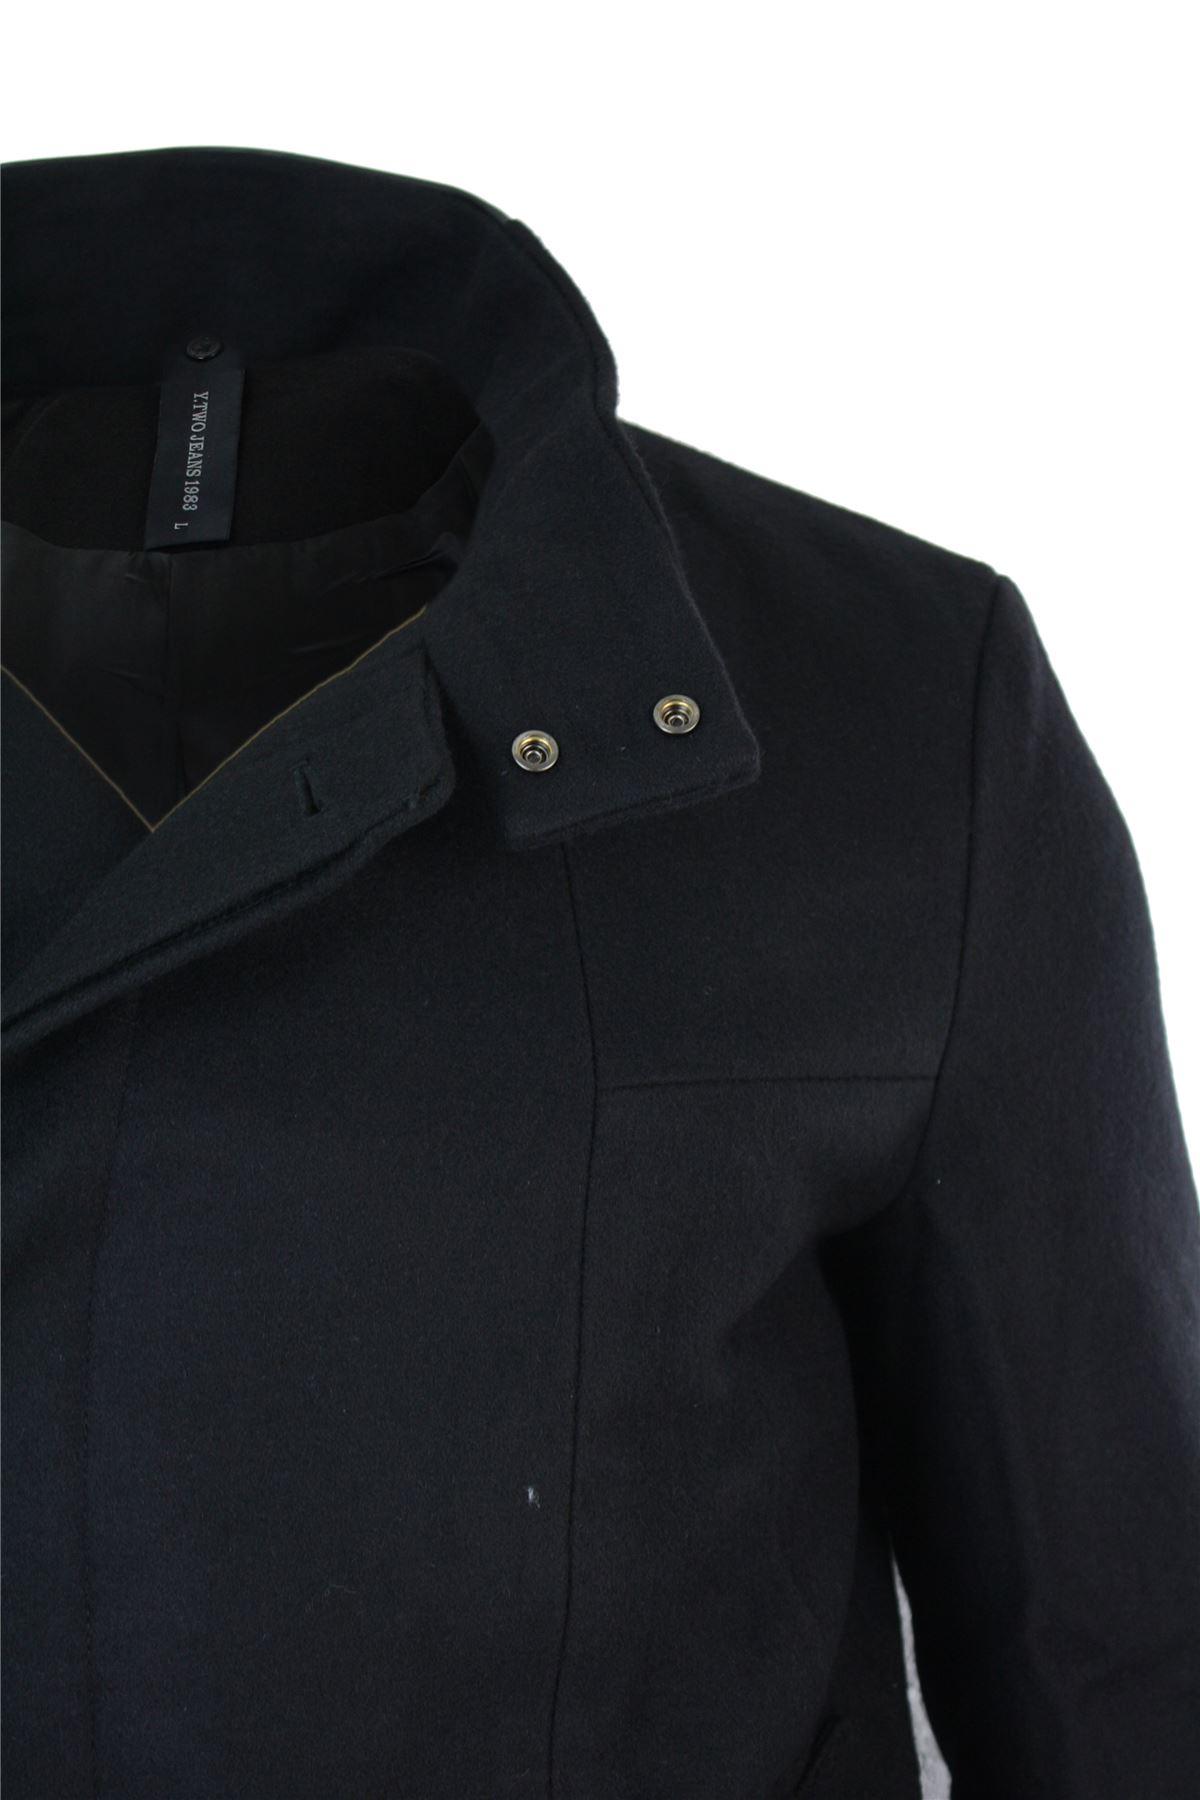 manteau homme veste cintr e 3 4 khaki olive noir col mao. Black Bedroom Furniture Sets. Home Design Ideas